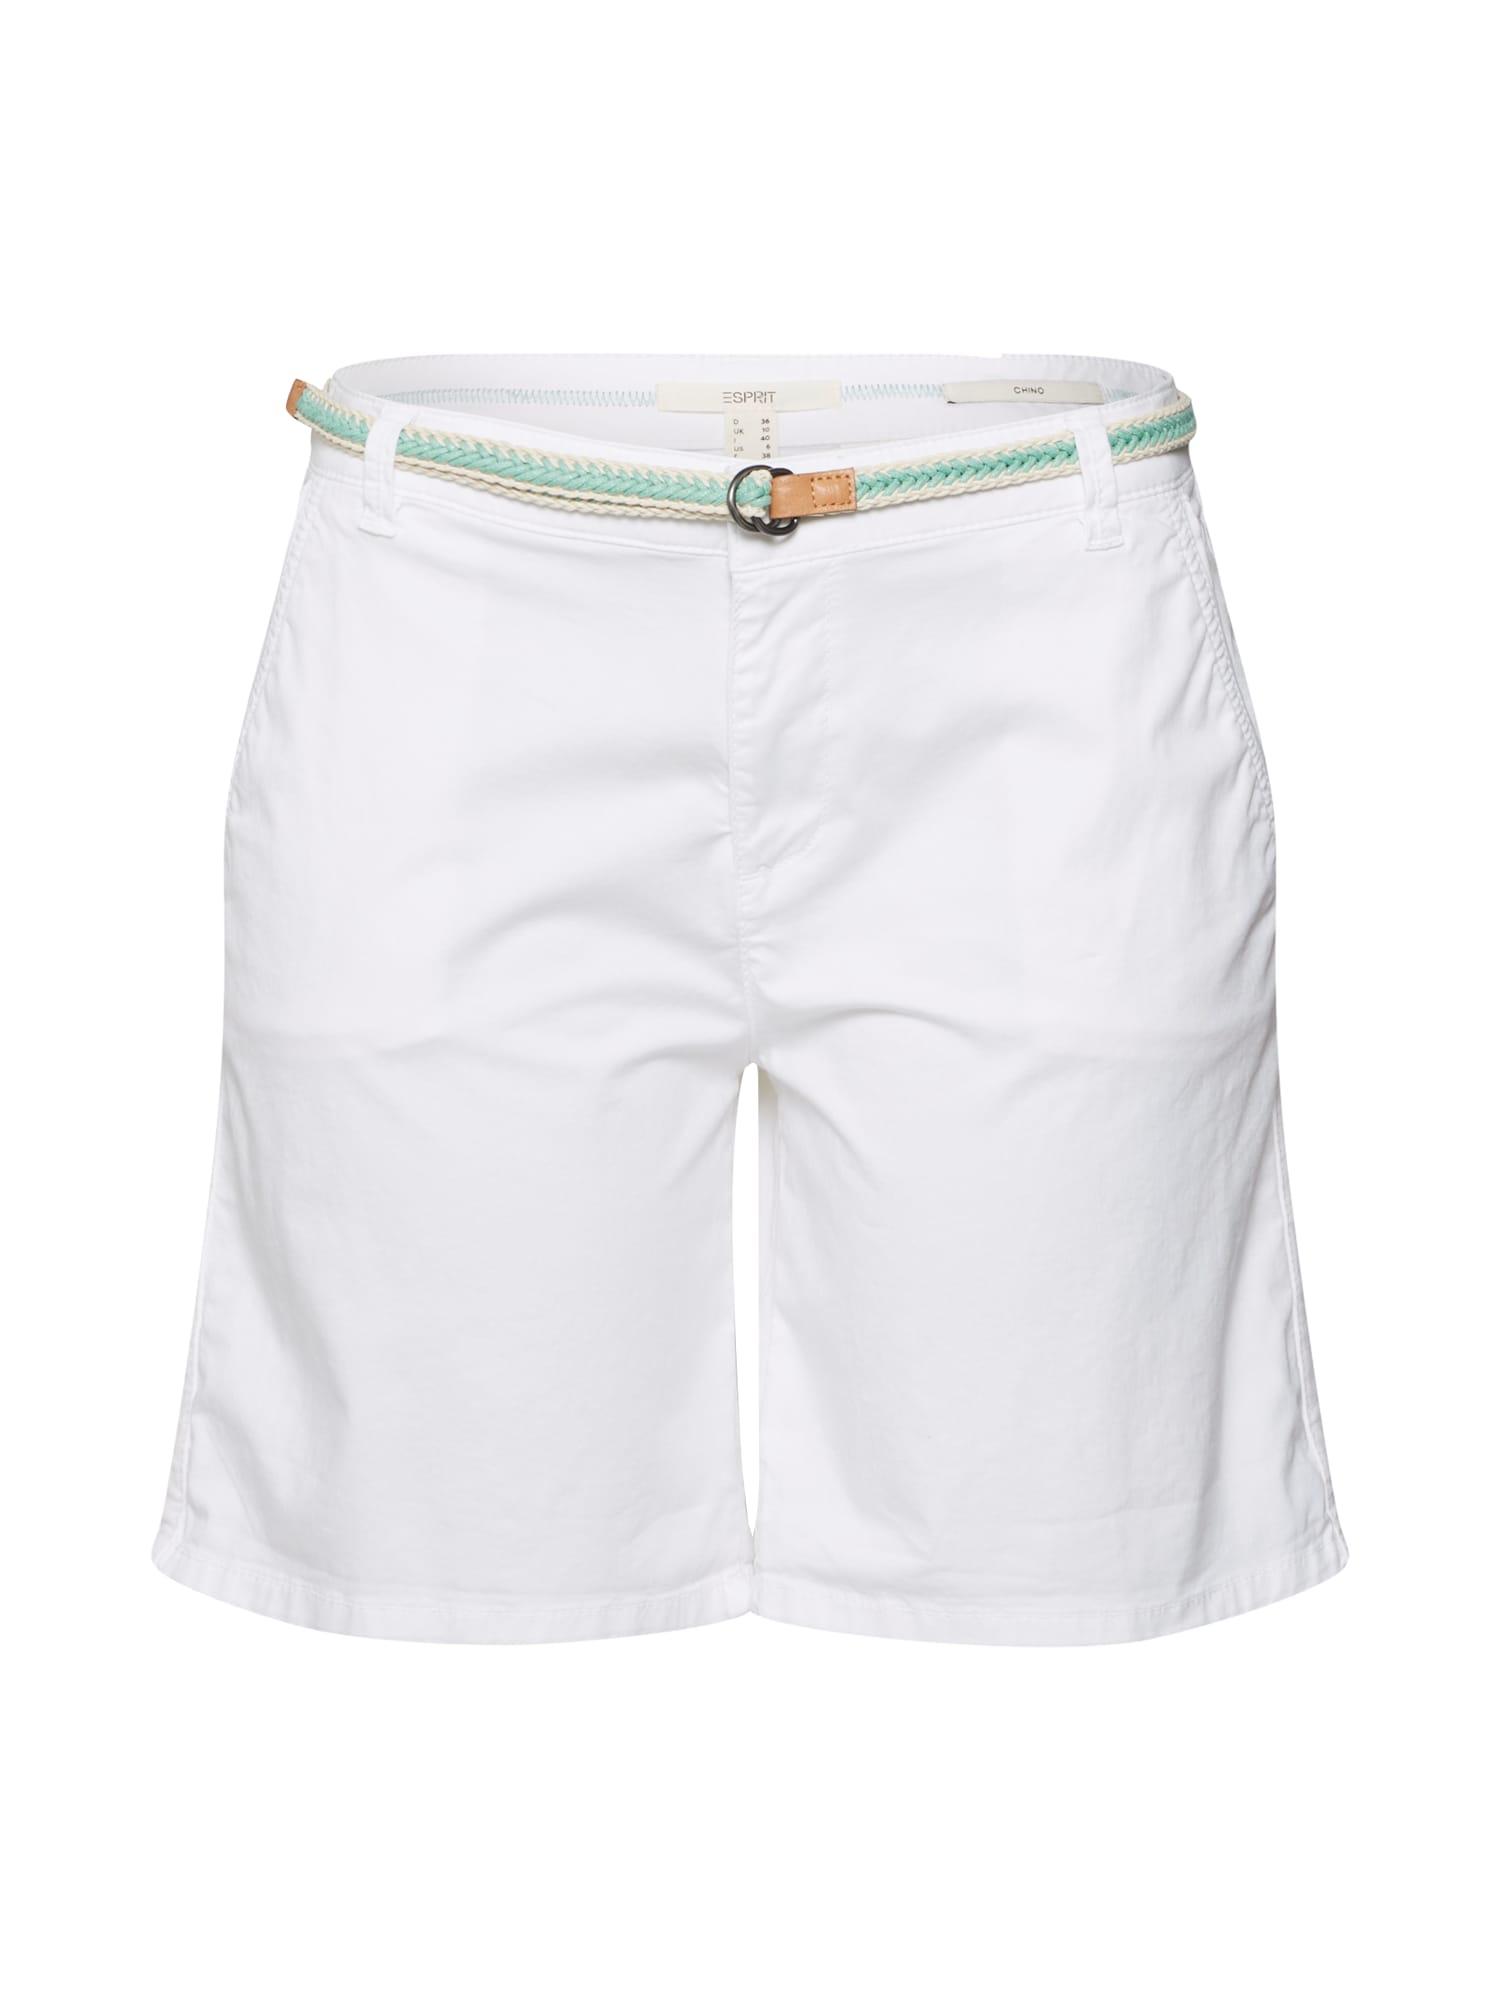 ESPRIT Chino stiliaus kelnės balta